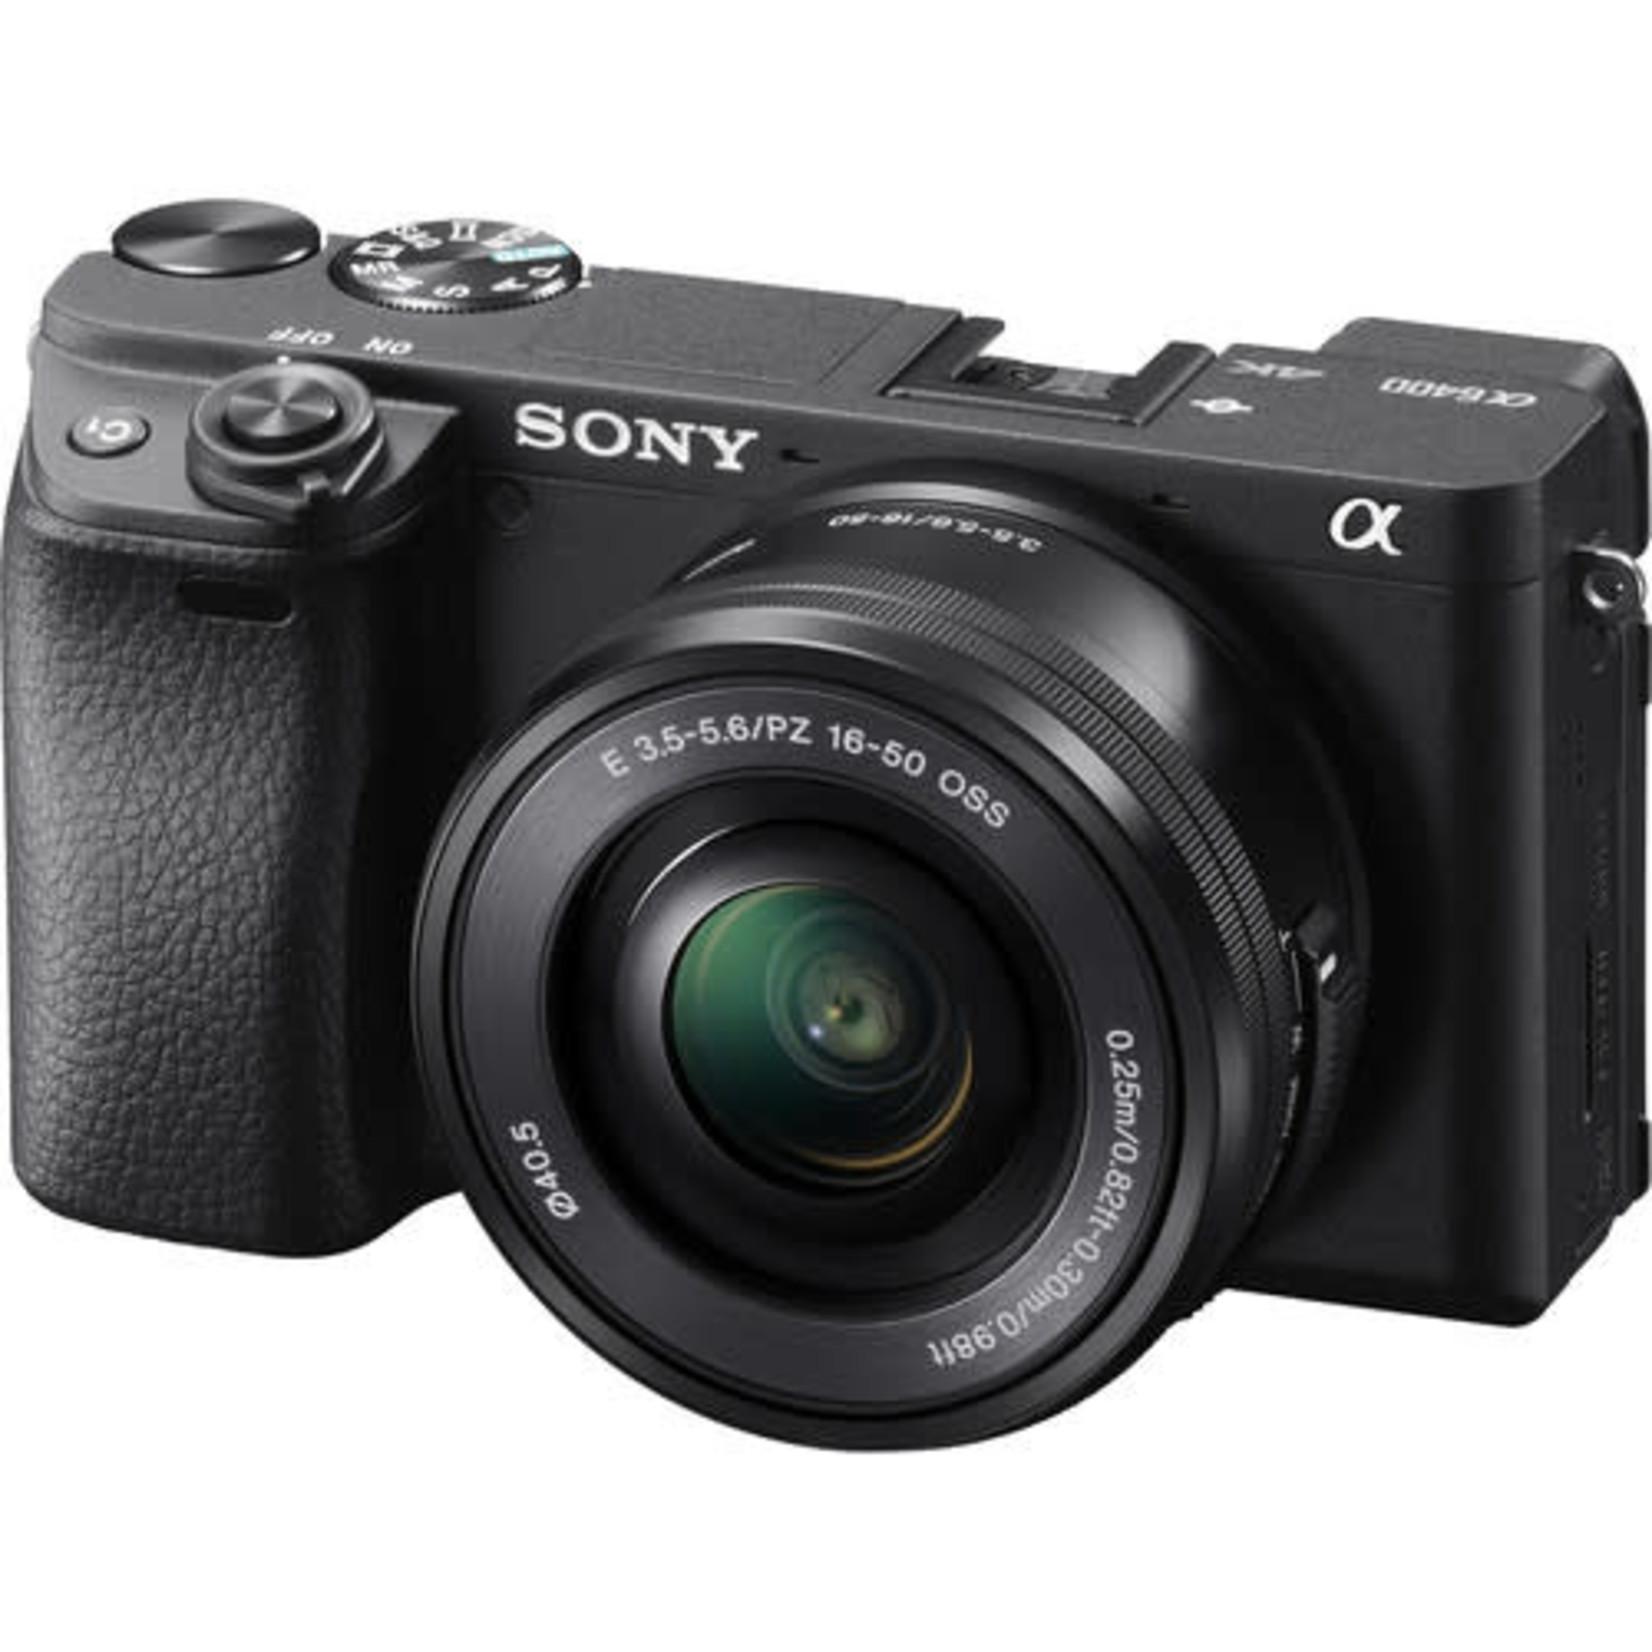 Sony Sony Alpha a6400 Mirrorless Digital Camera with 16-50mm Lens